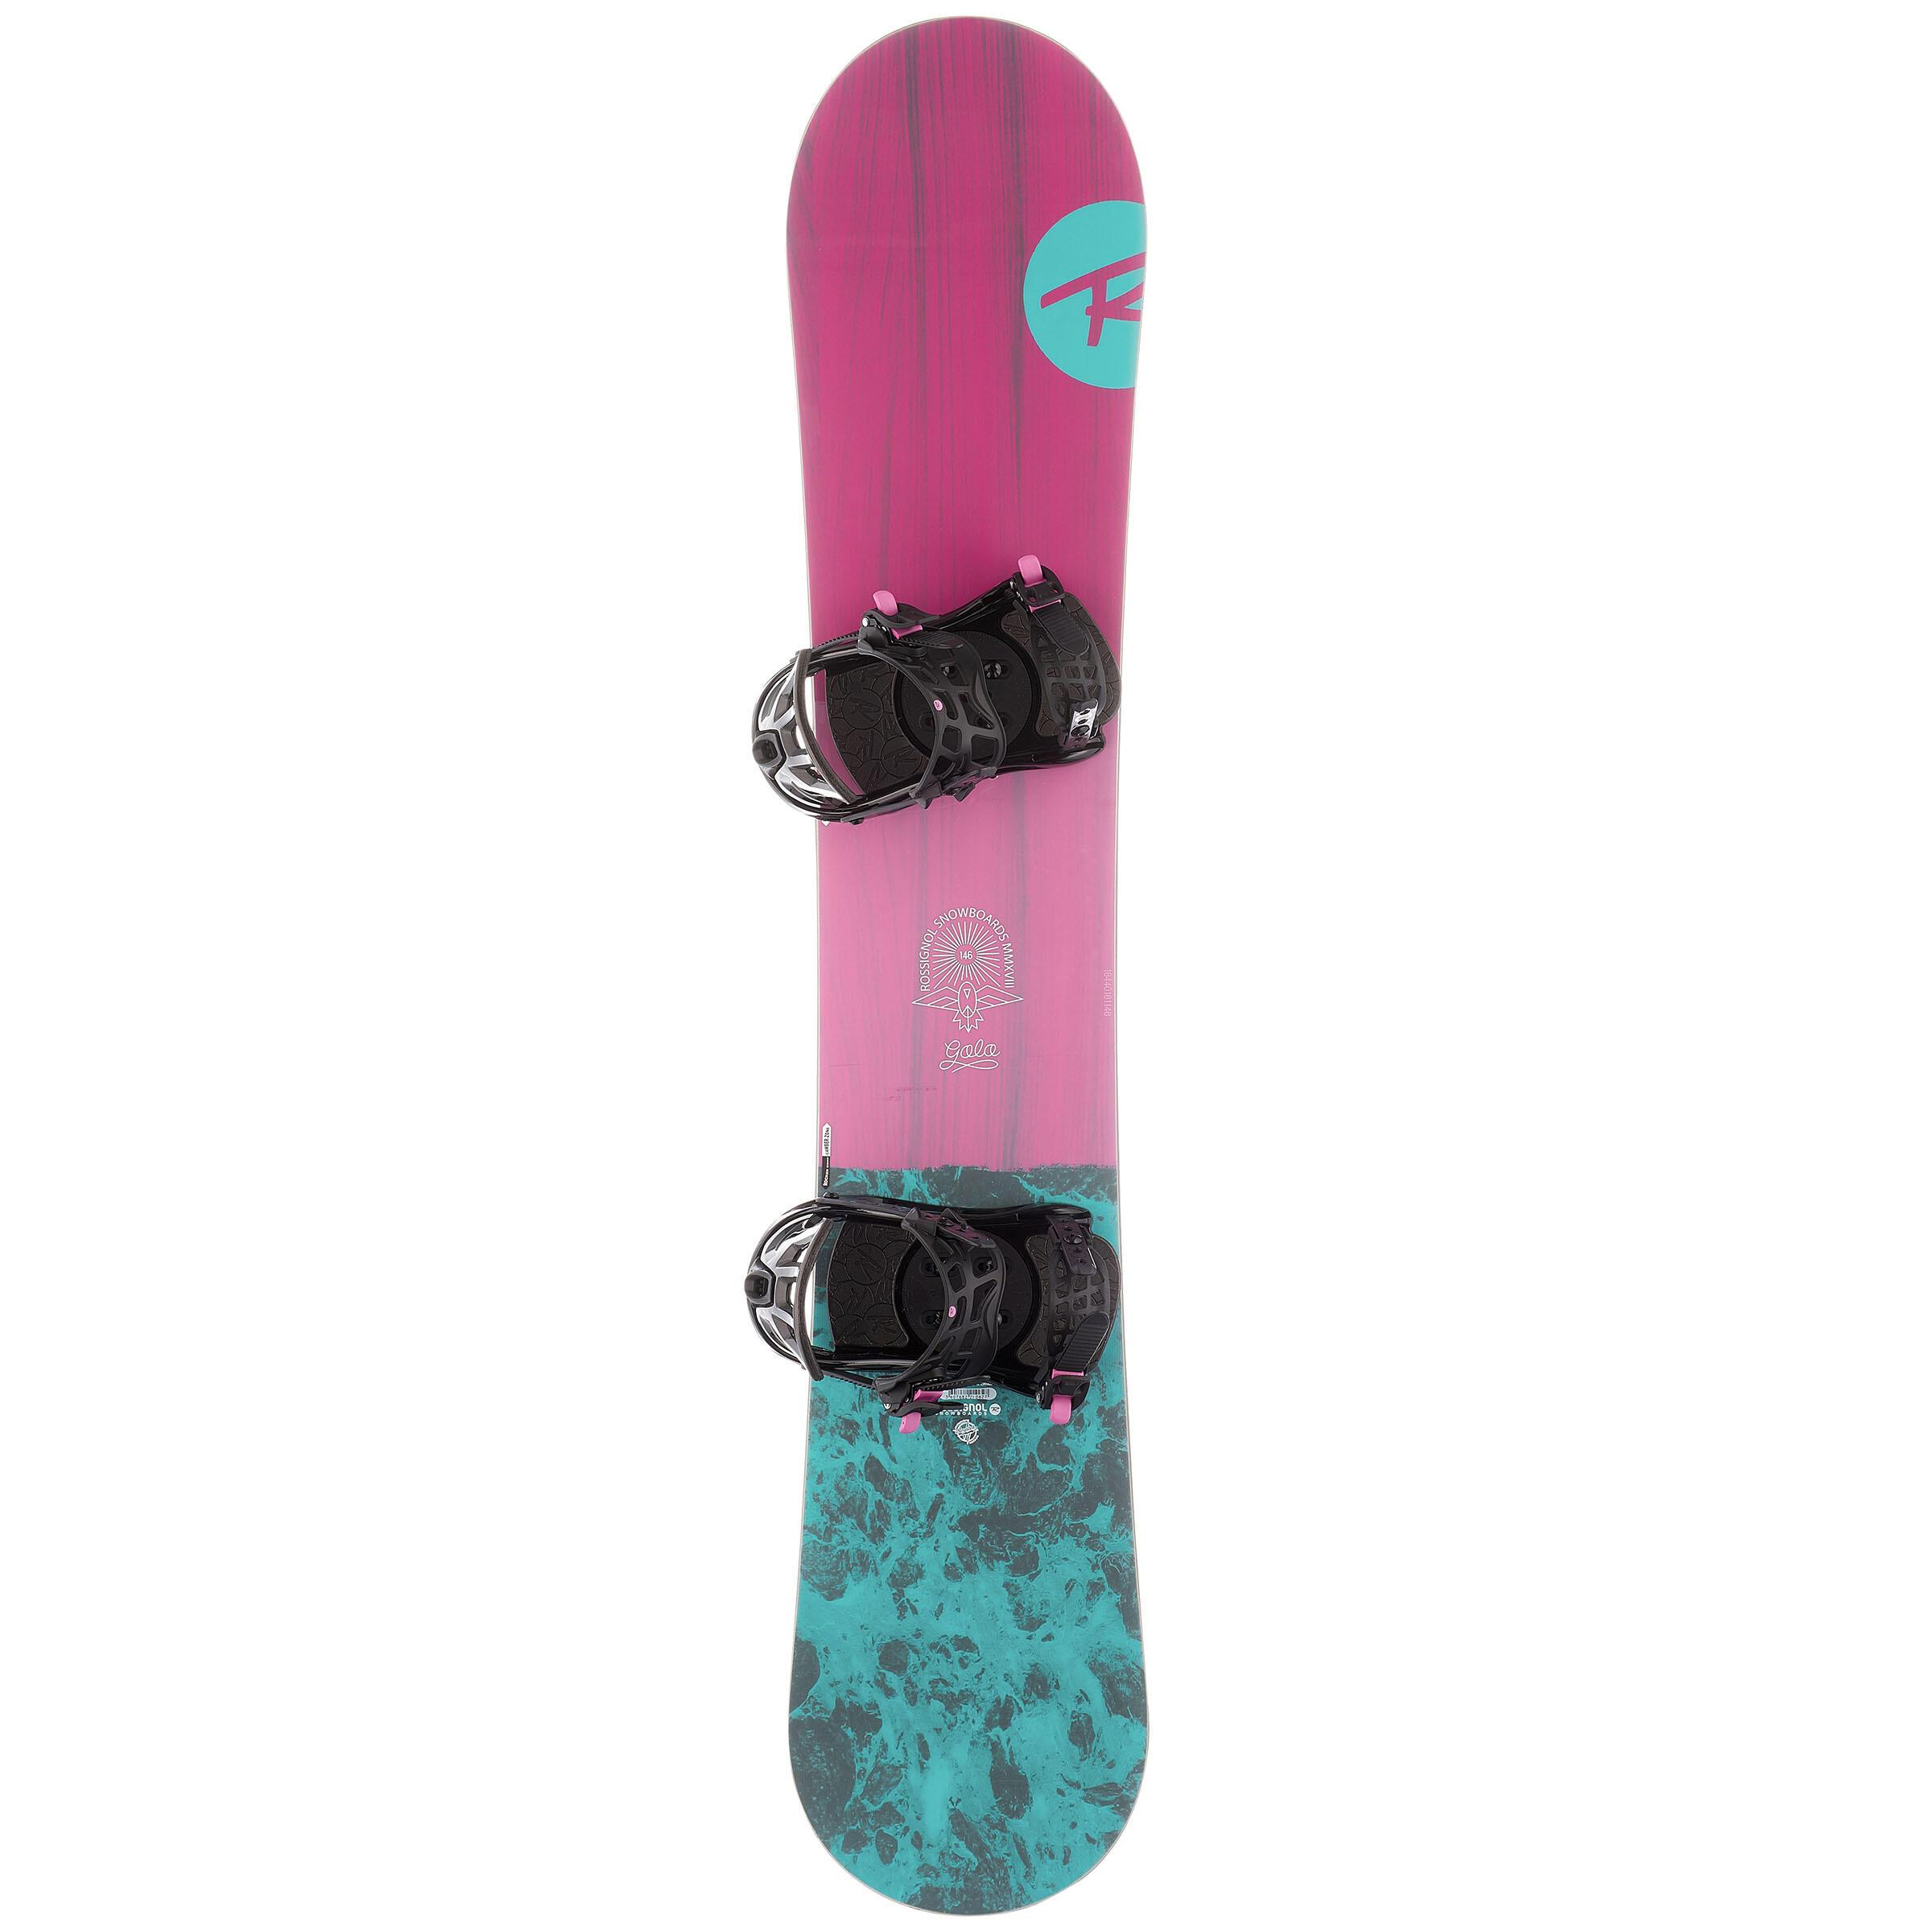 Rossignol Pack piste en all-mountain snowboard voor dames Gala roze en blauw